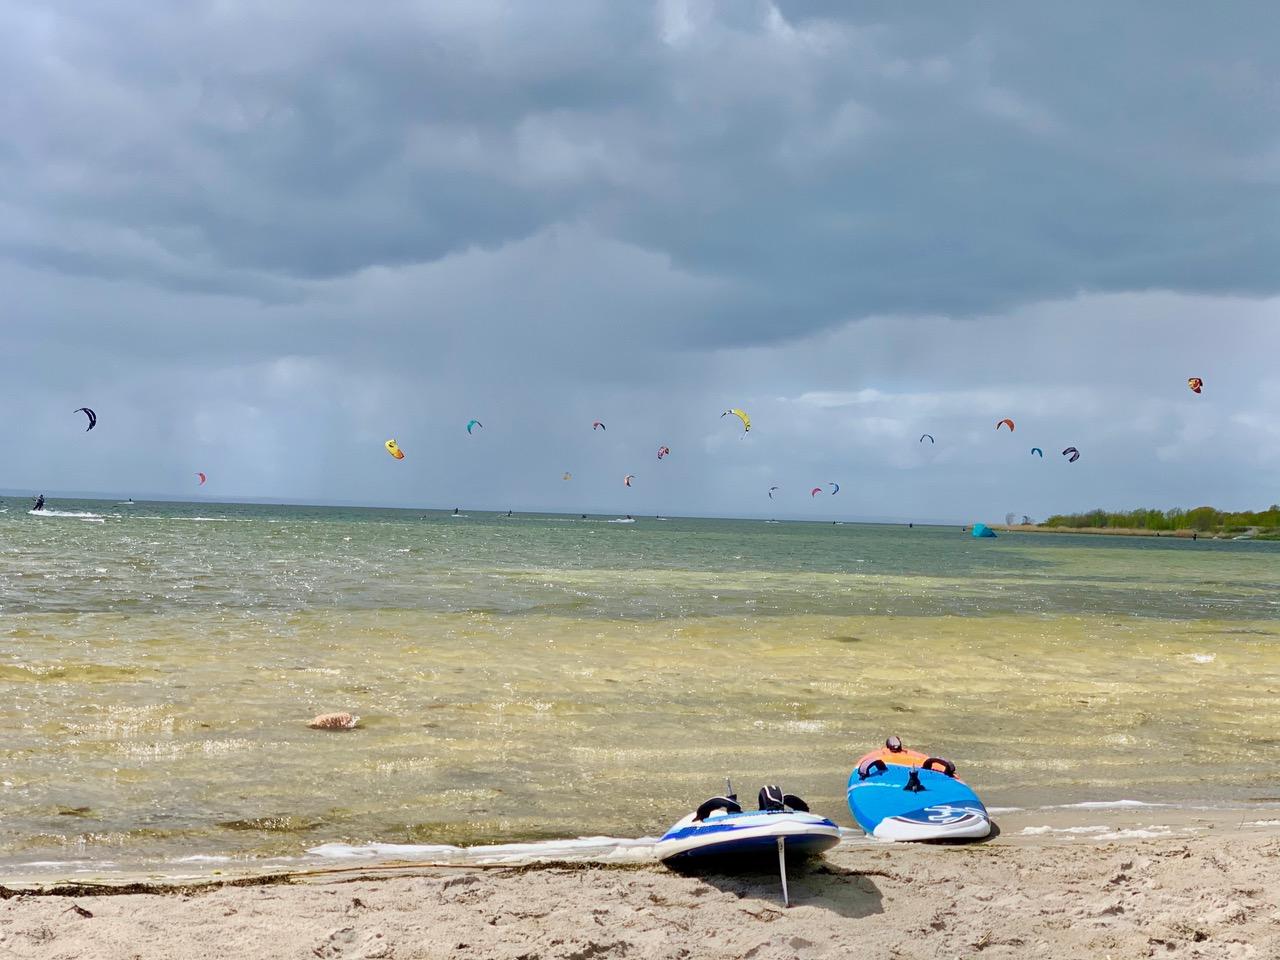 Hel et kite paradis i Polen!